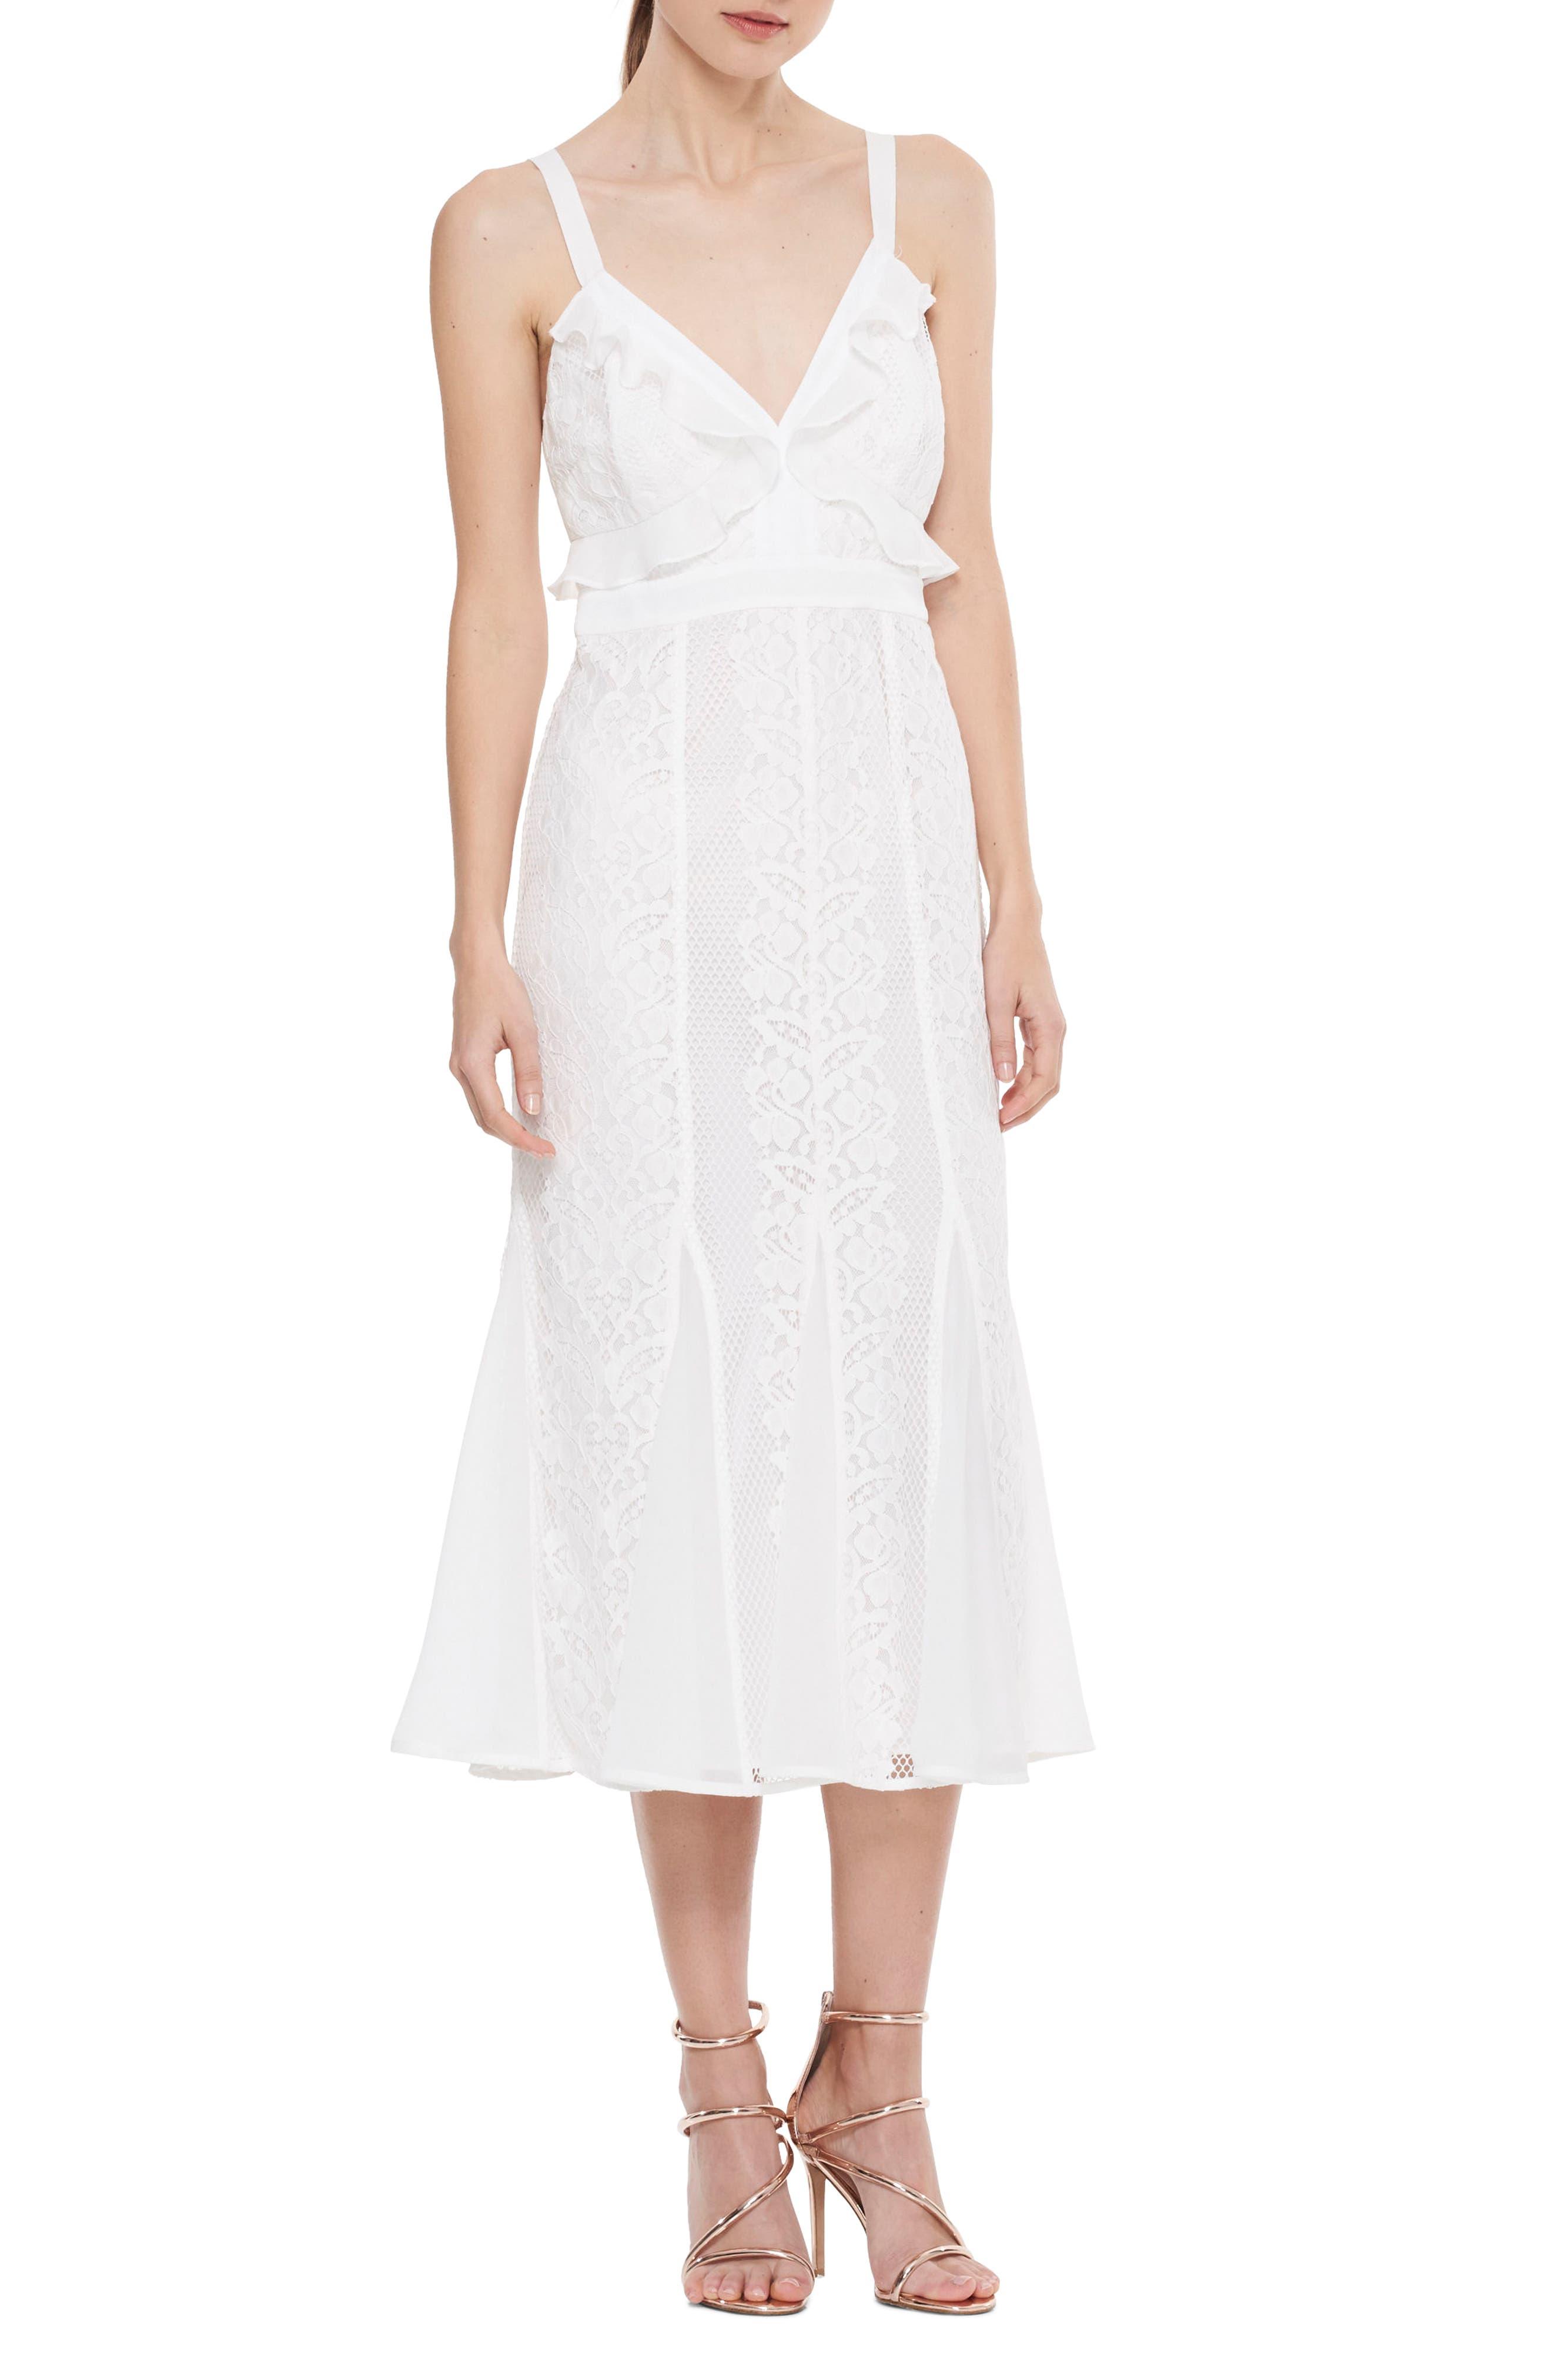 Adoring Ruffle Lace Midi Dress,                             Main thumbnail 1, color,                             White